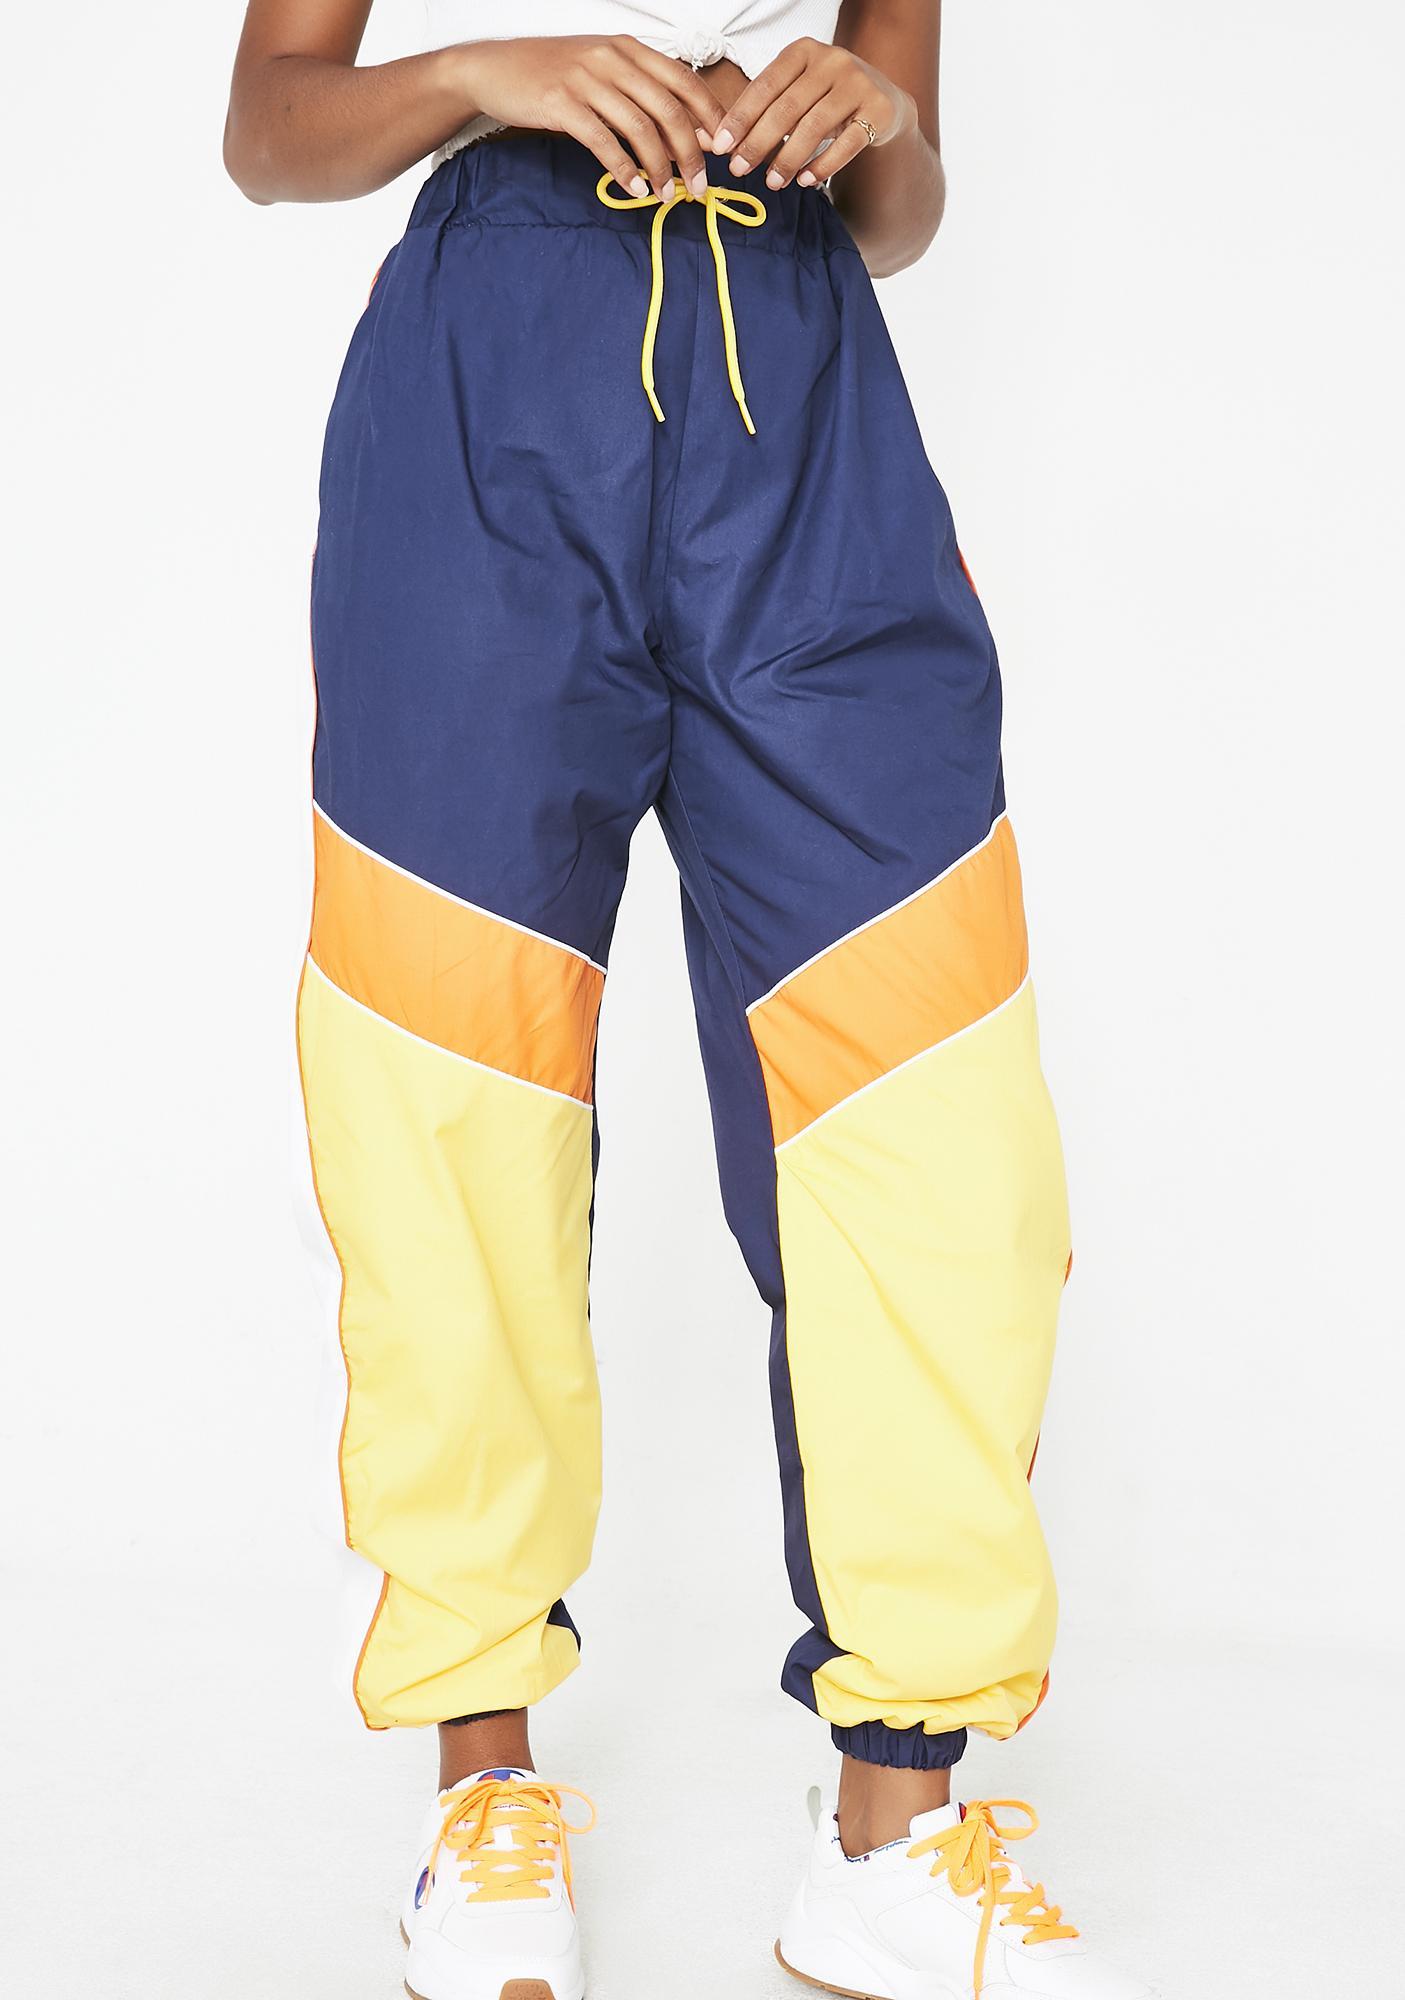 The Ragged Priest Gridlock Pants